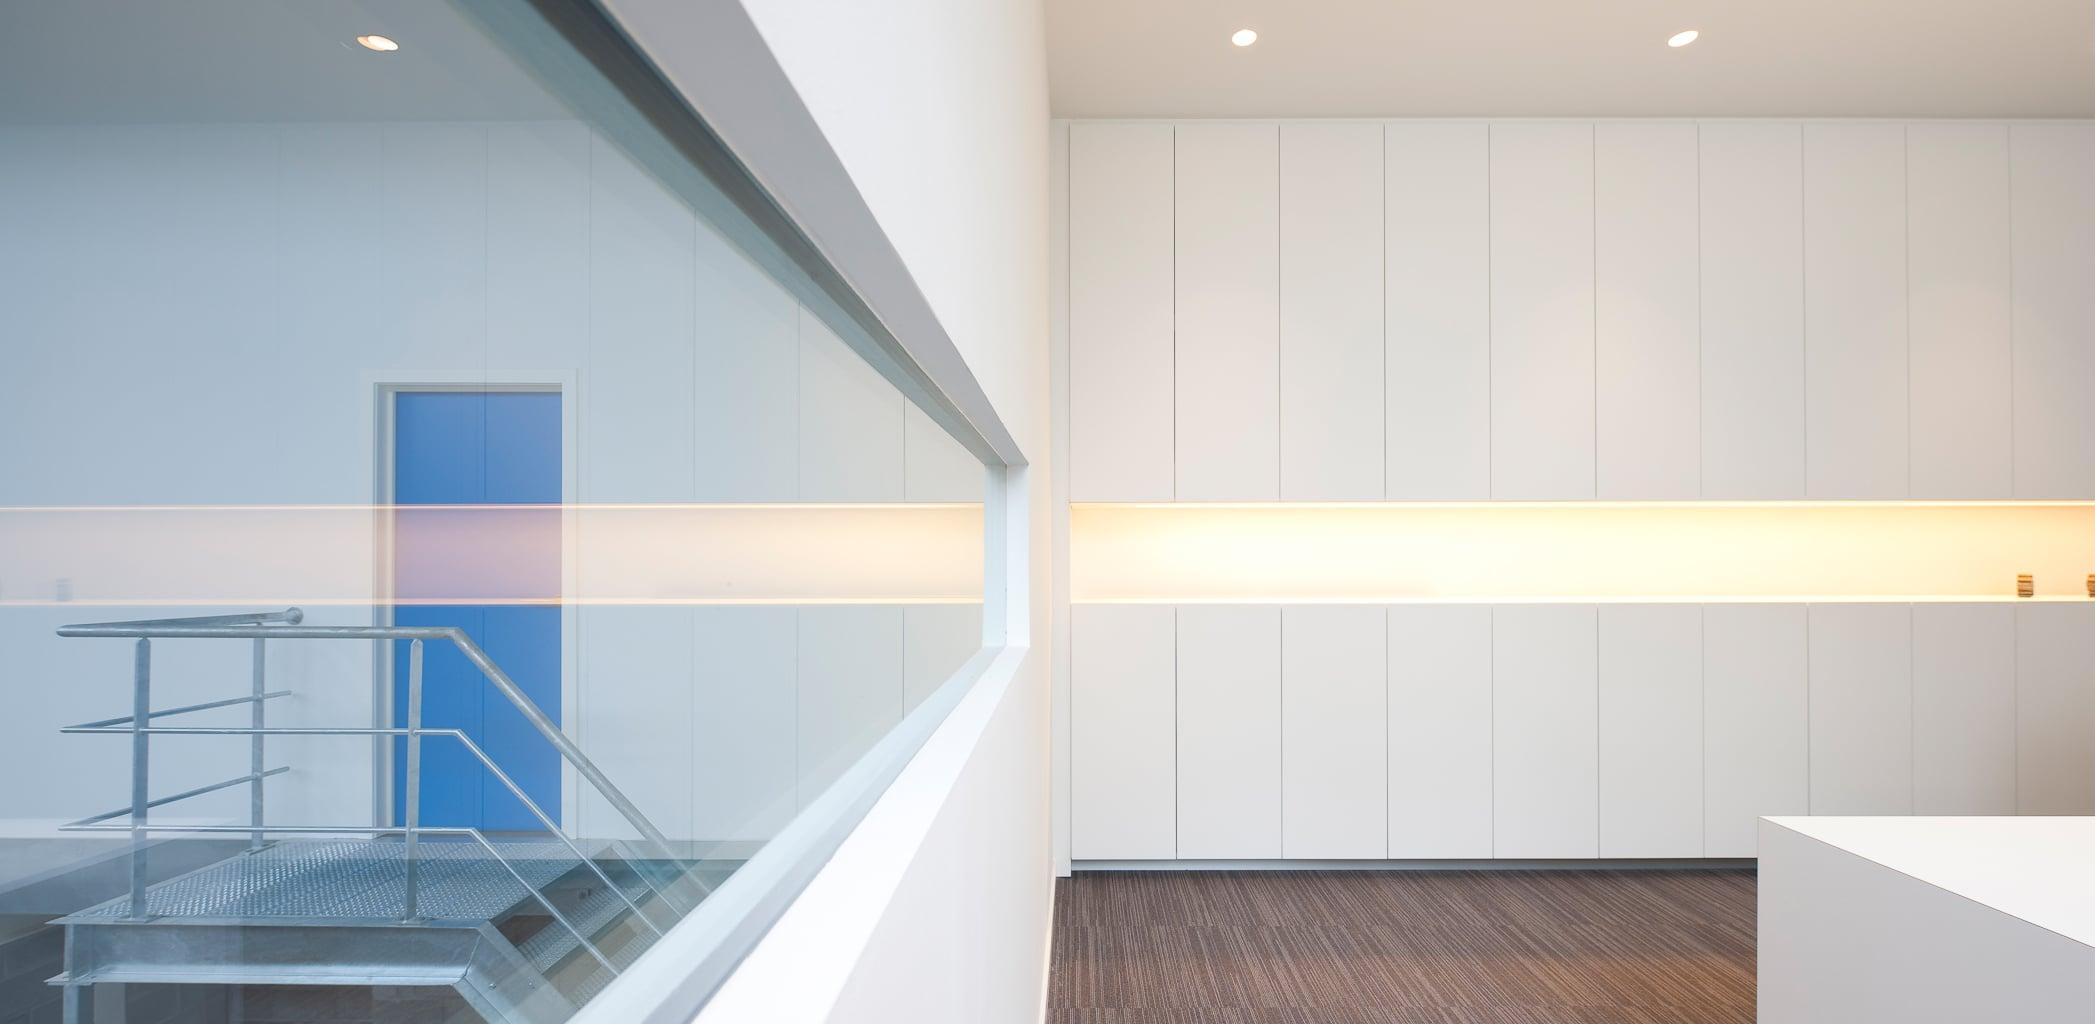 LRP5248web | Baeyens & Beck architecten Gent | architect nieuwbouw renovatie interieur | high end | architectenbureau